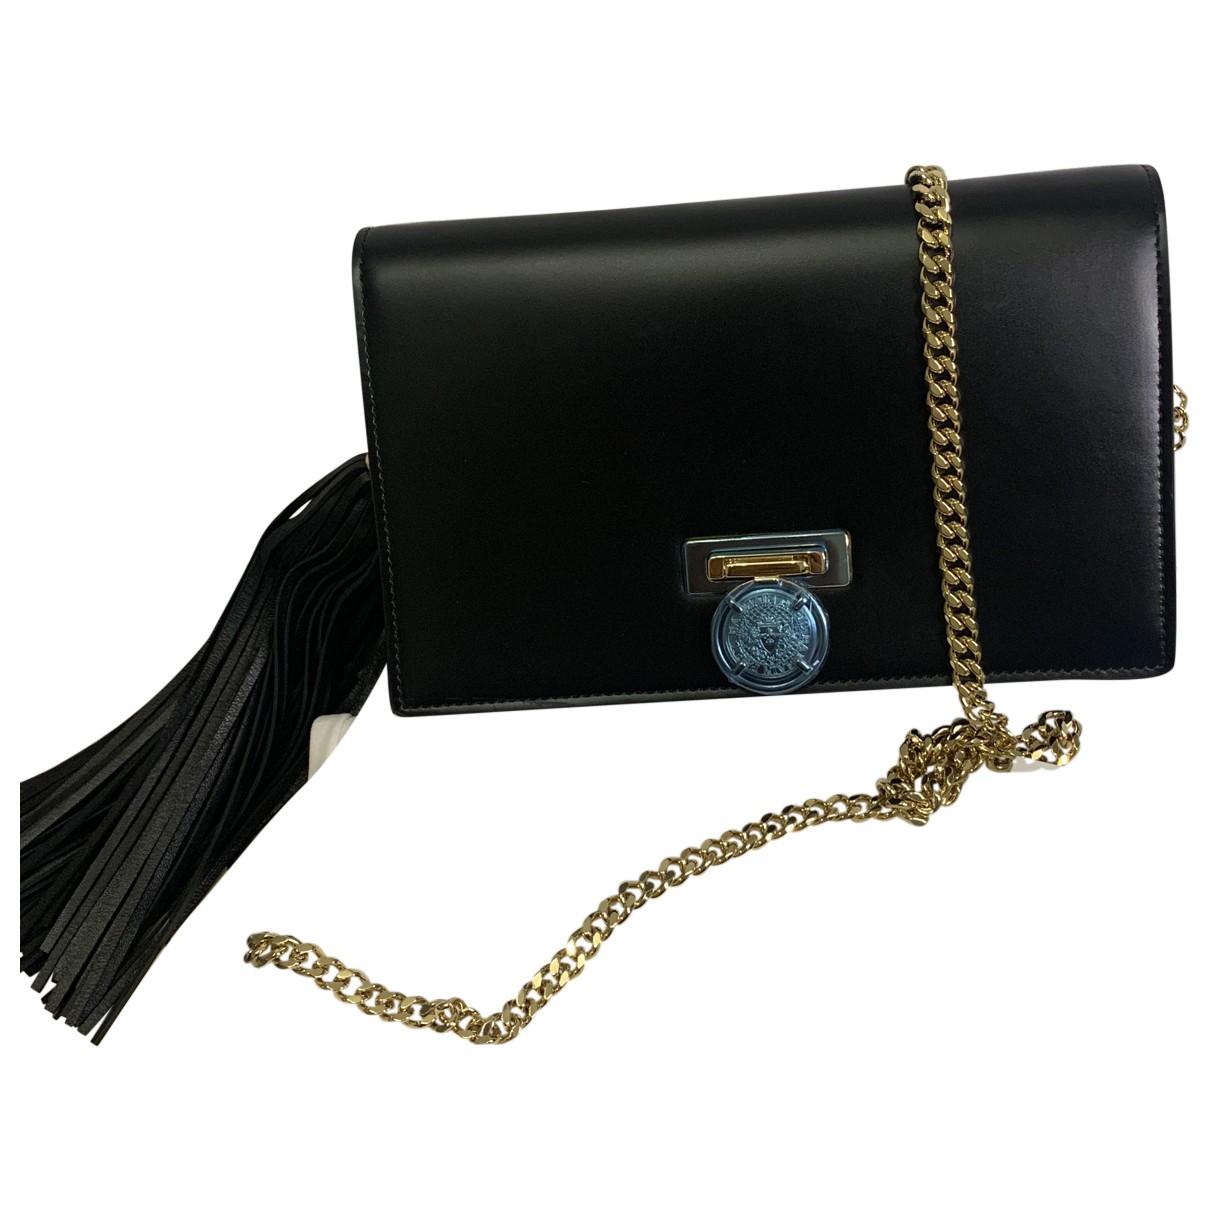 Balmain Ring box 20 Black Leather handbag for Women N